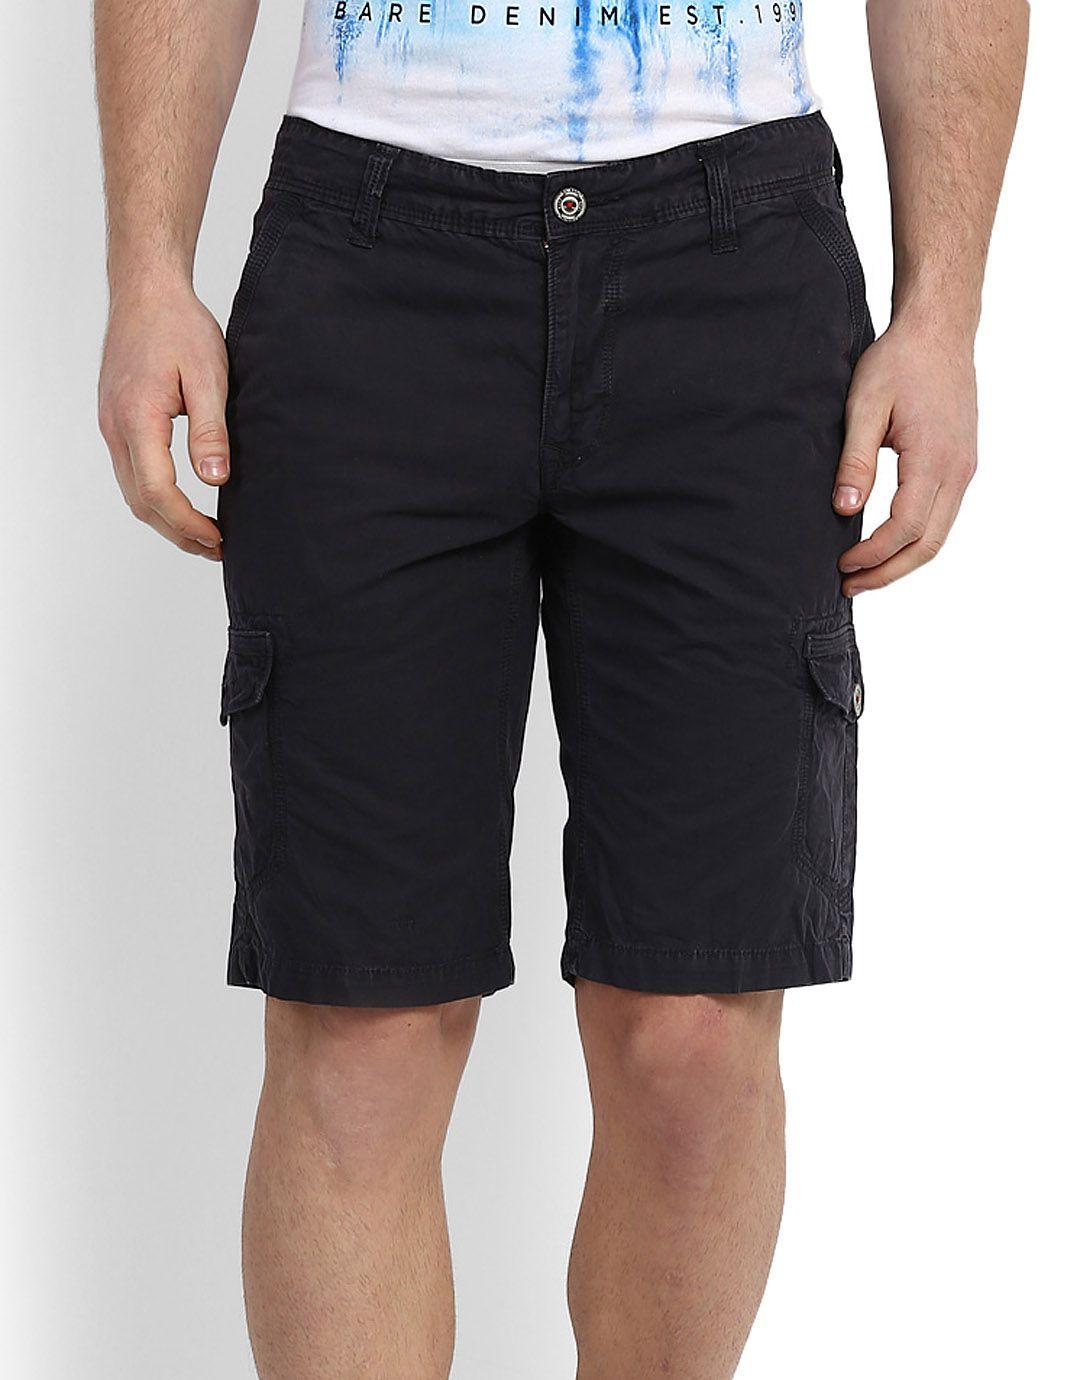 LAWMAN pg3 Black Shorts